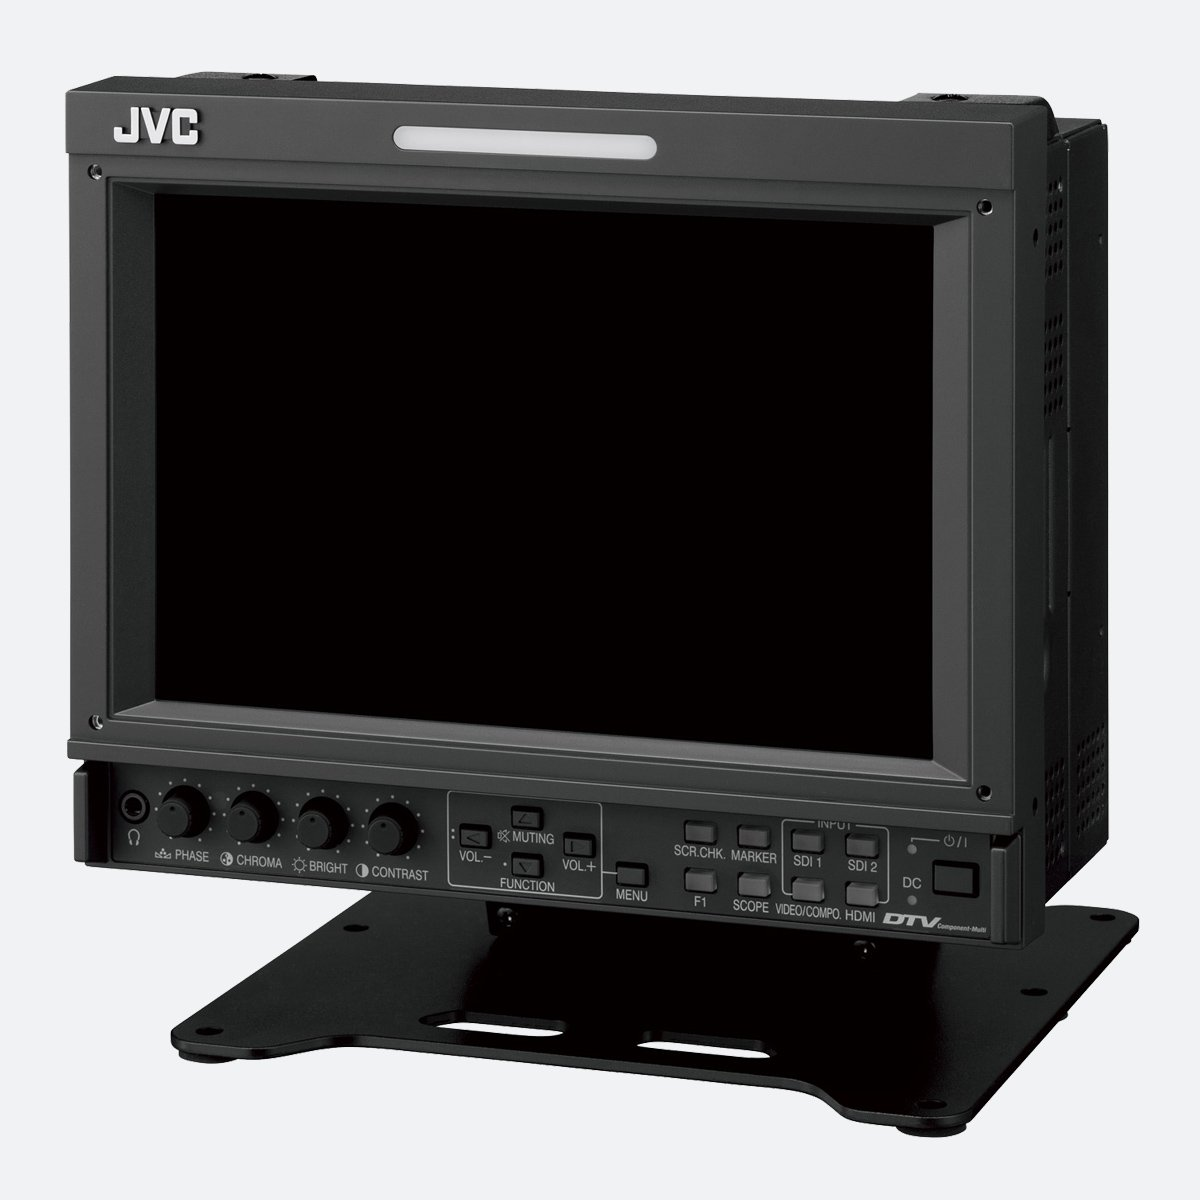 "JVC DT-V9L5 8.2"" Studio Monitor"